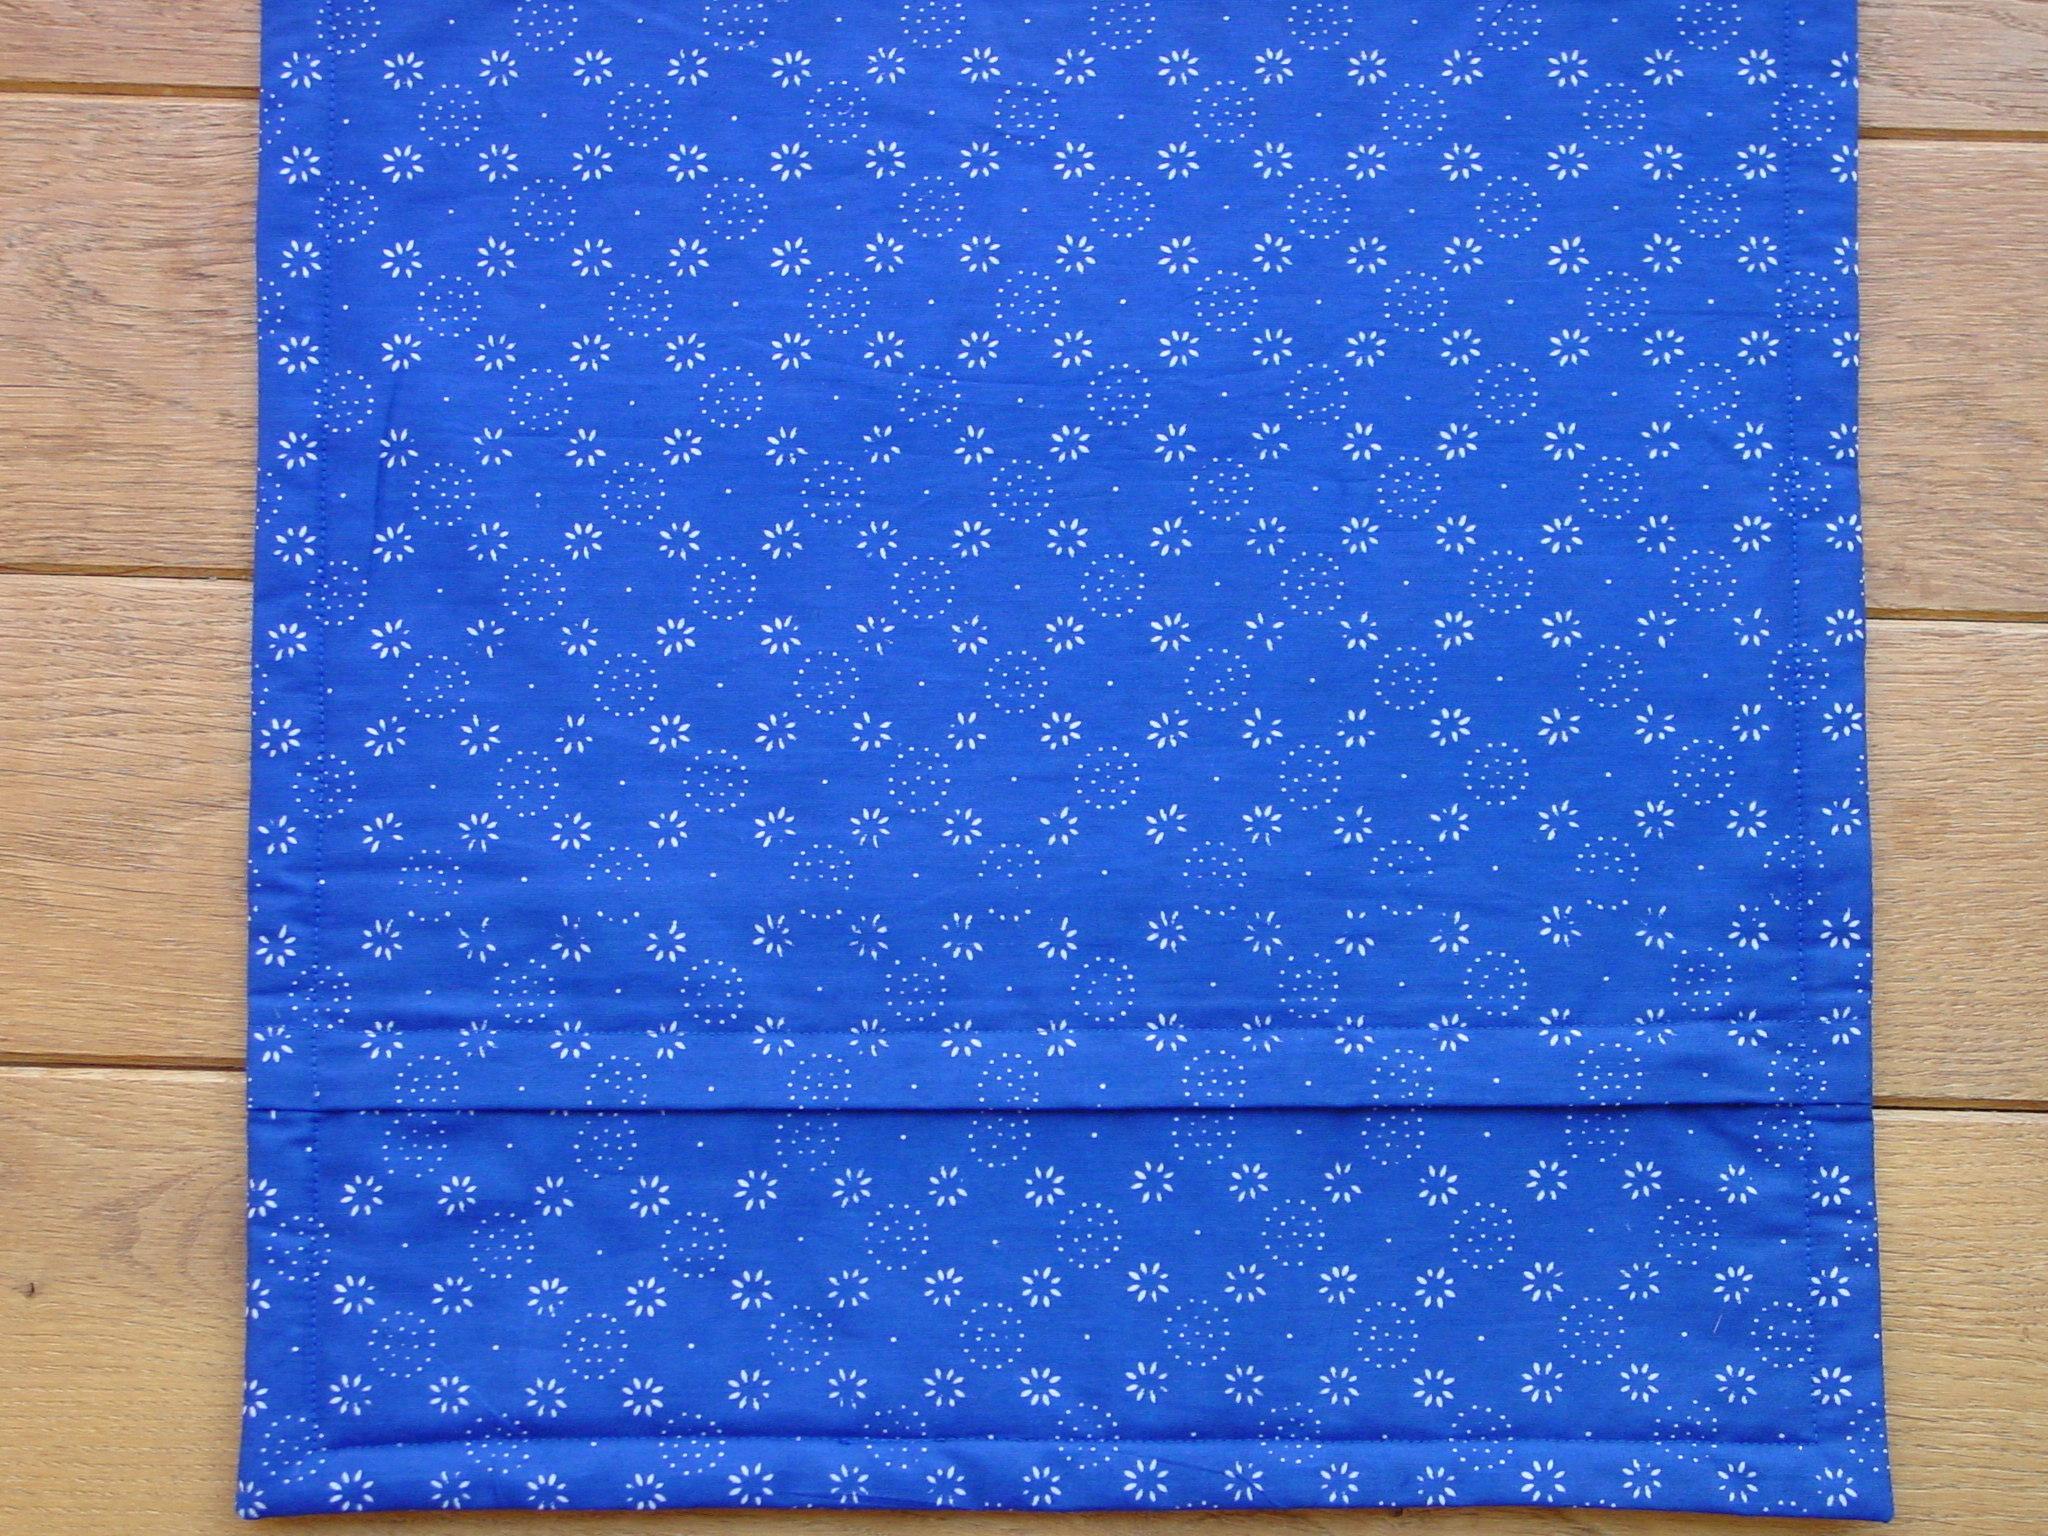 Blaudruck - Kissenbezug 7110-1118